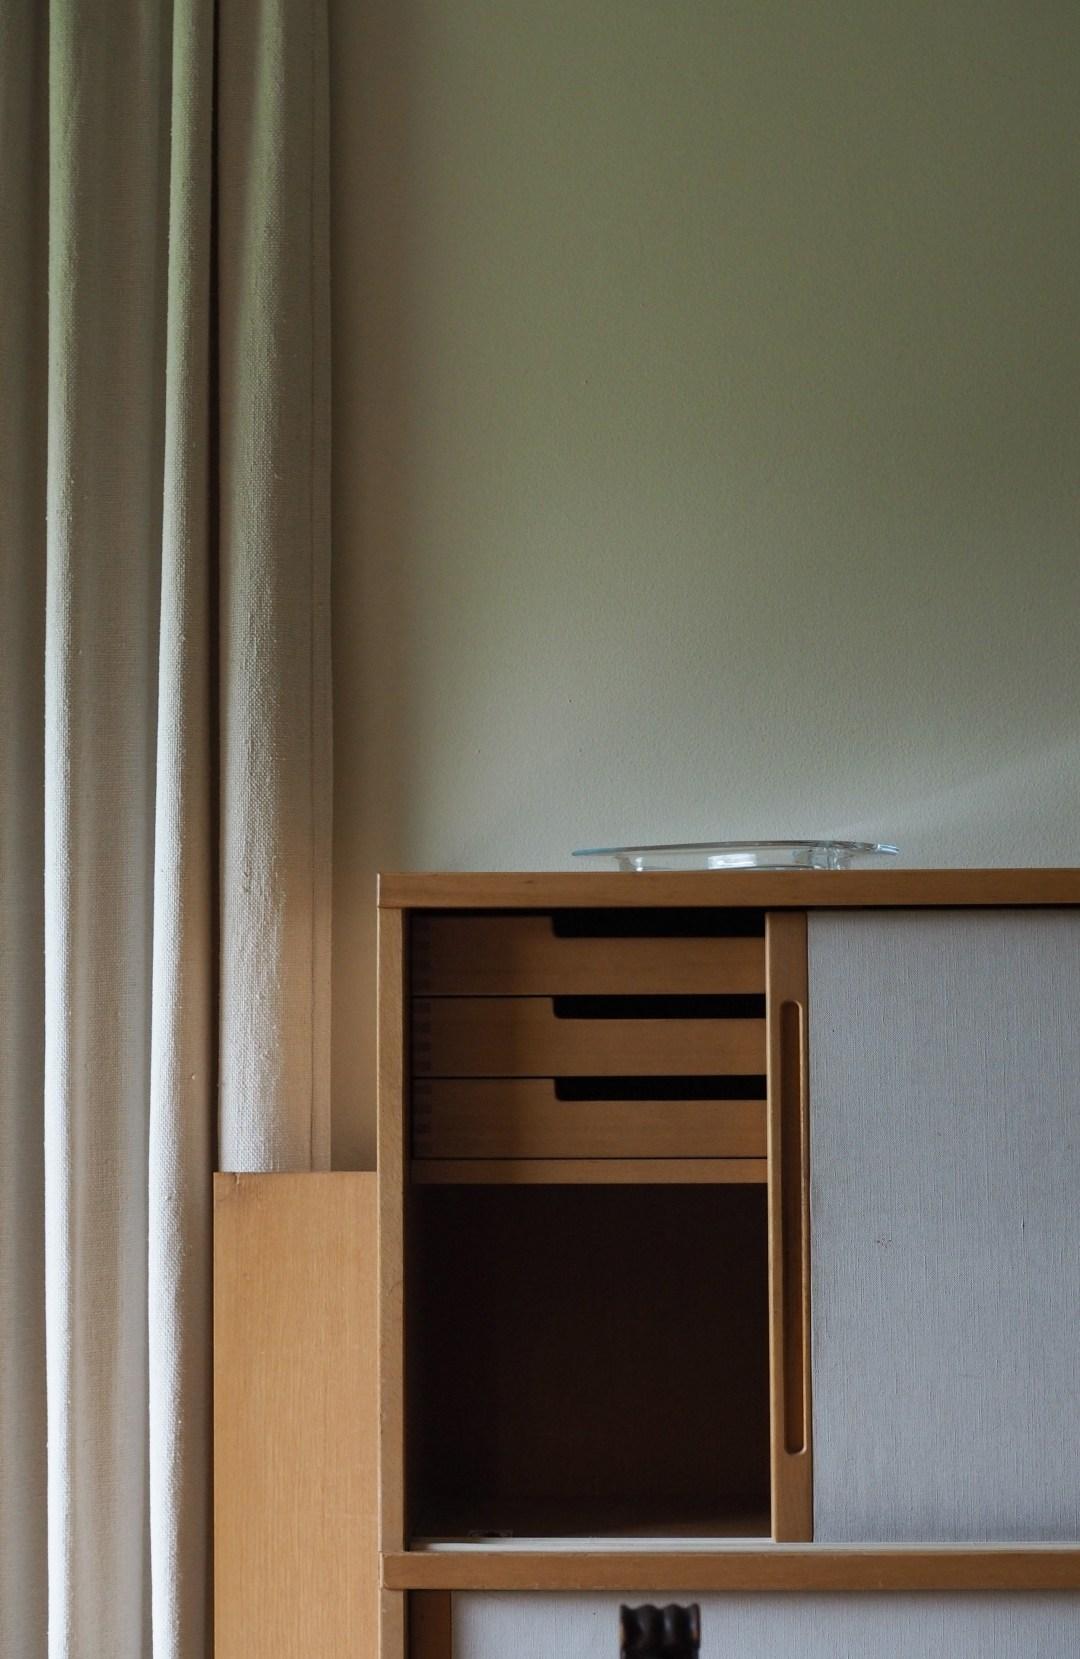 furniture details Aalto